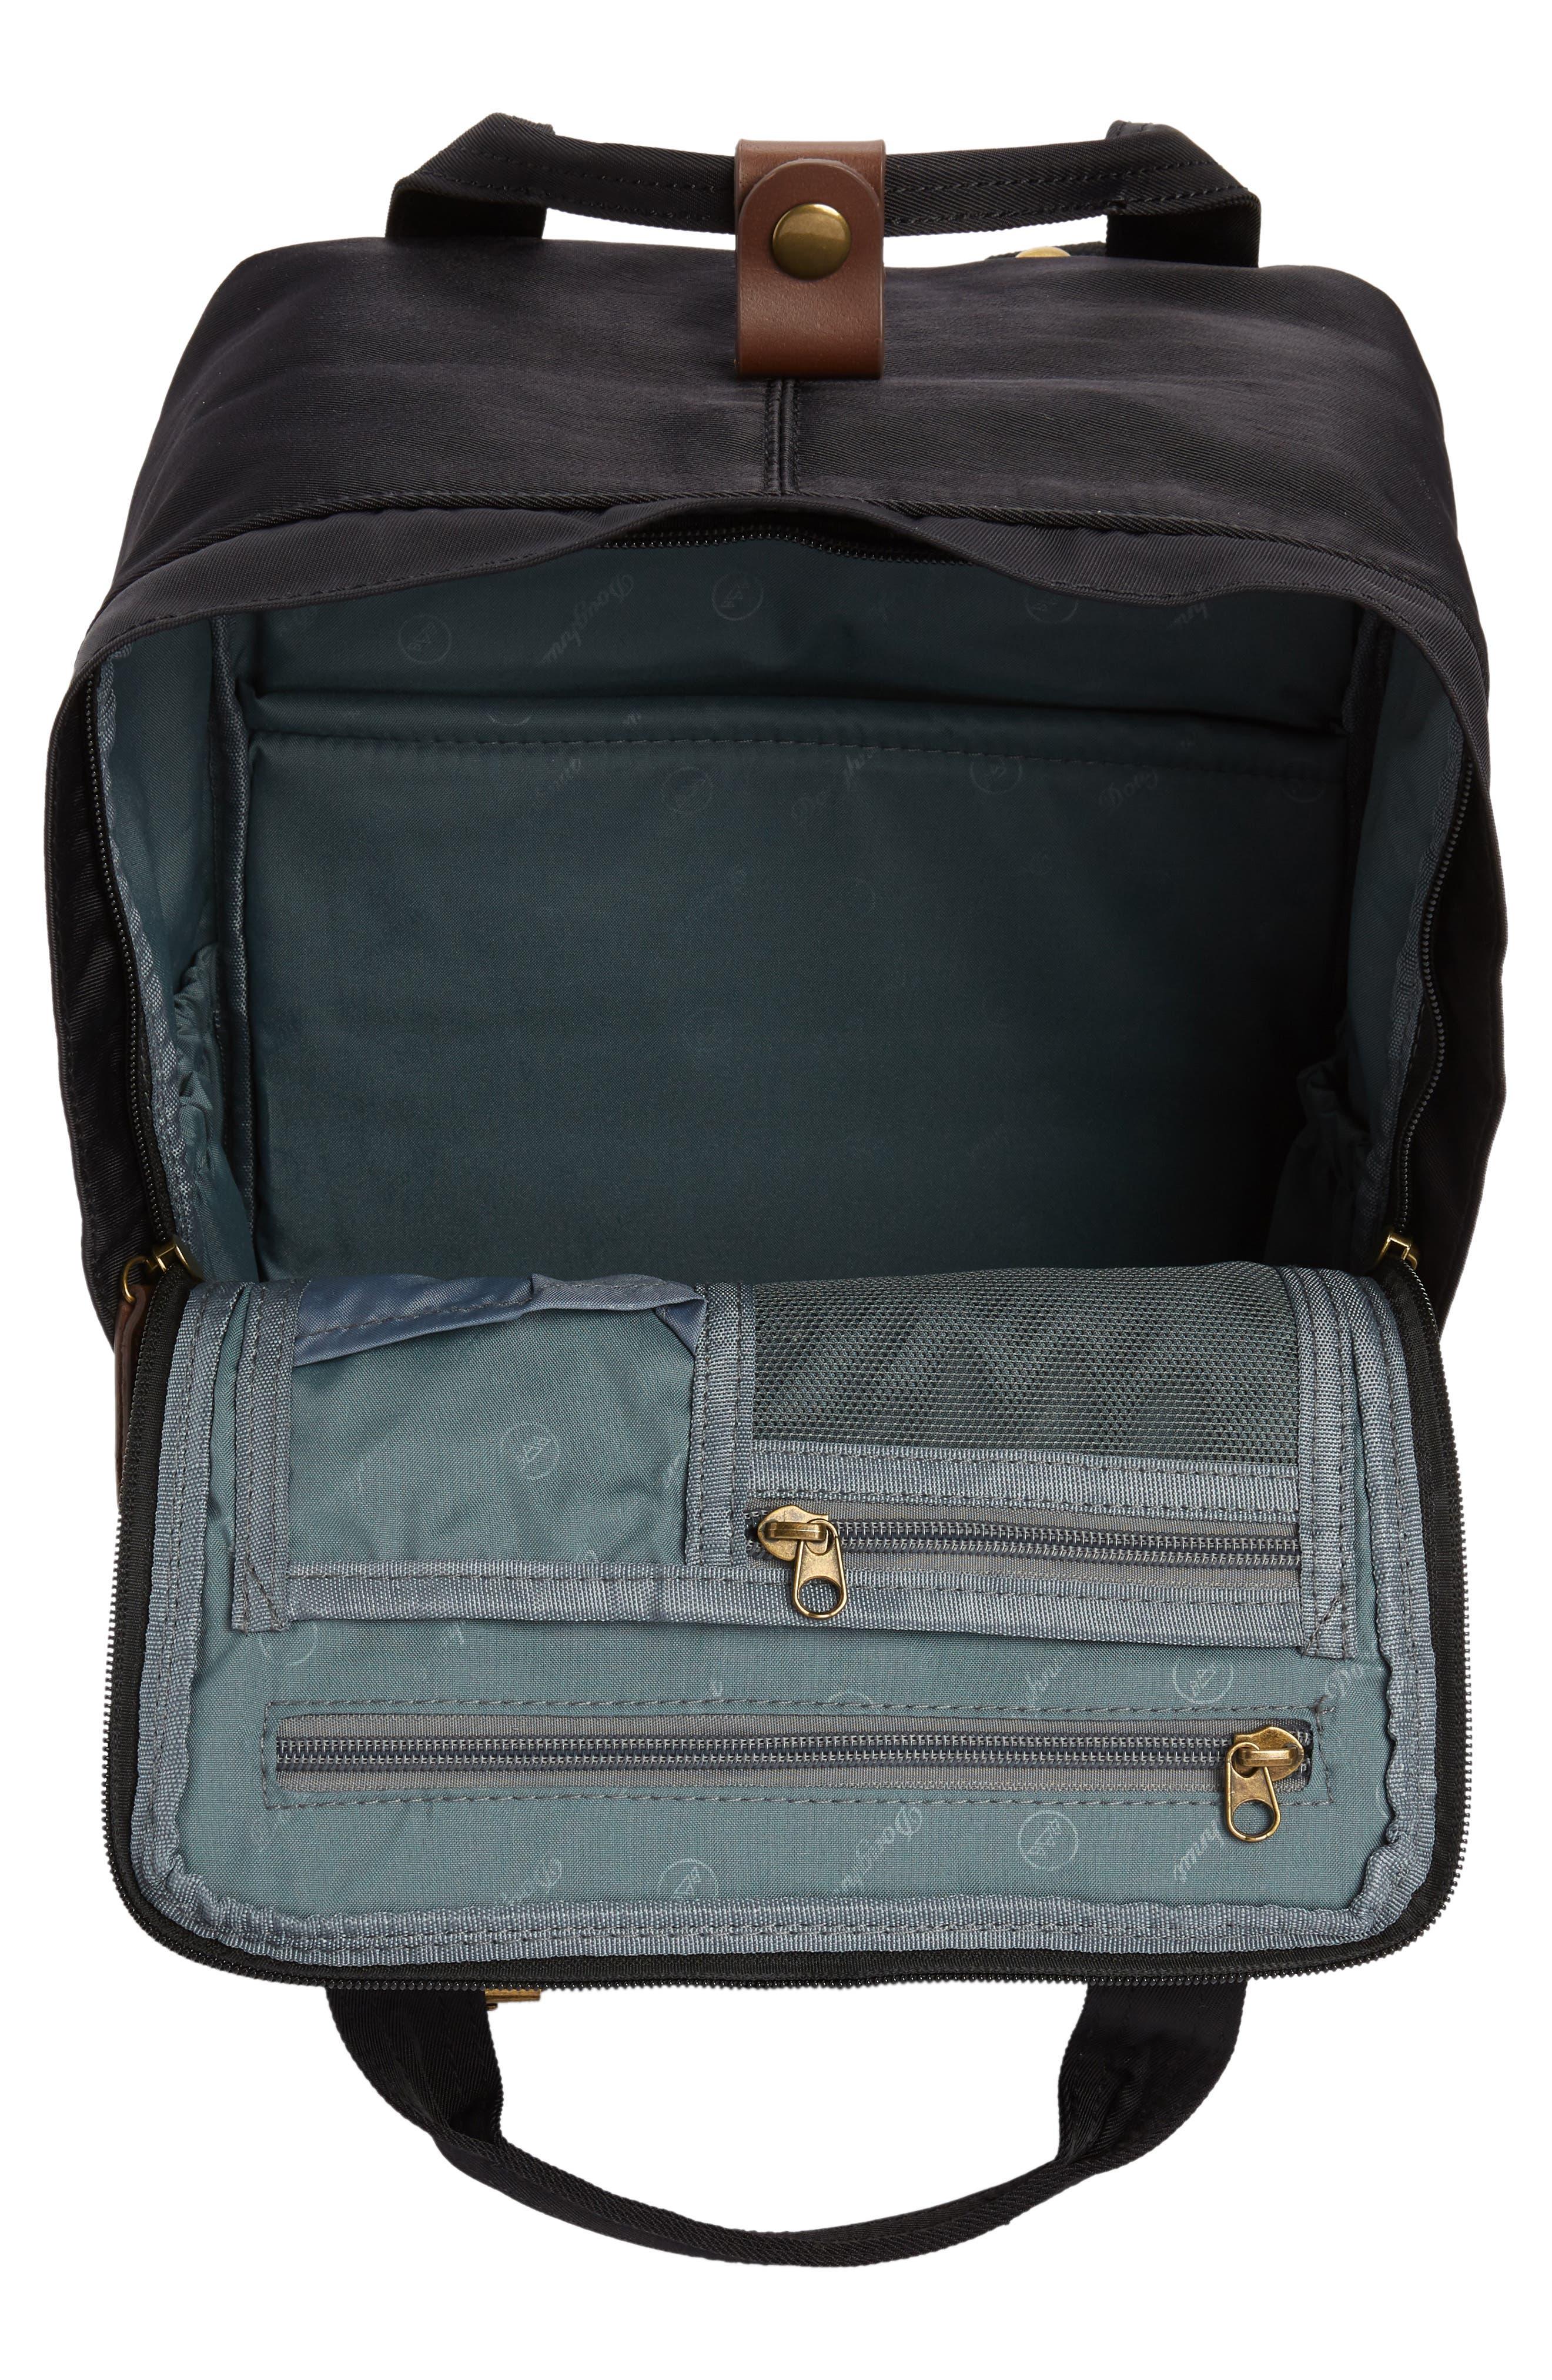 Macaroon Water Resistant Backpack,                             Alternate thumbnail 4, color,                             BLACK